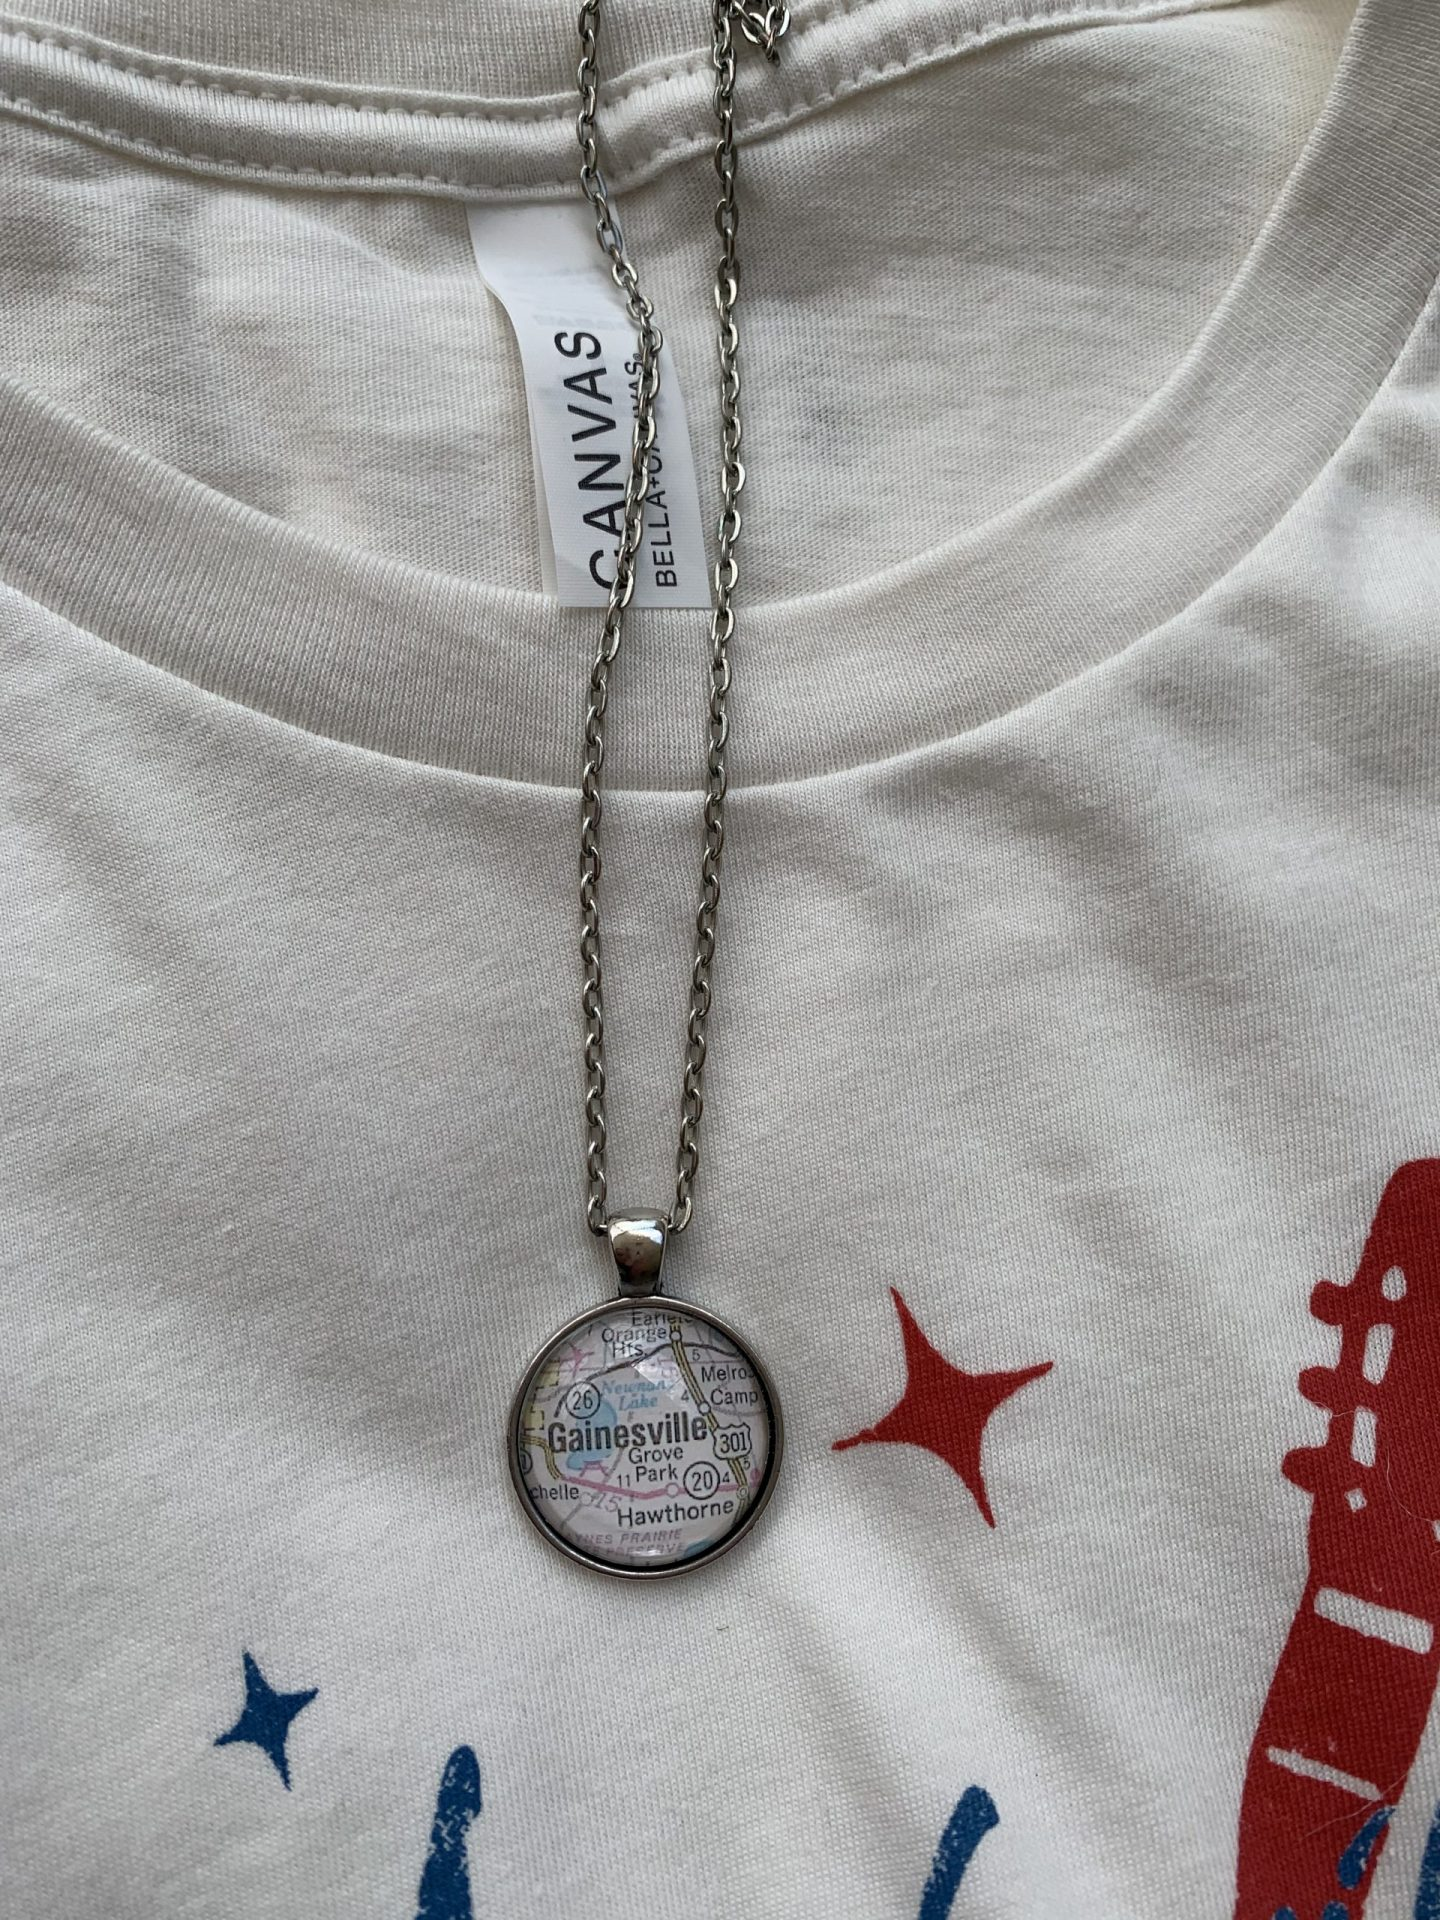 Gainesville Necklace